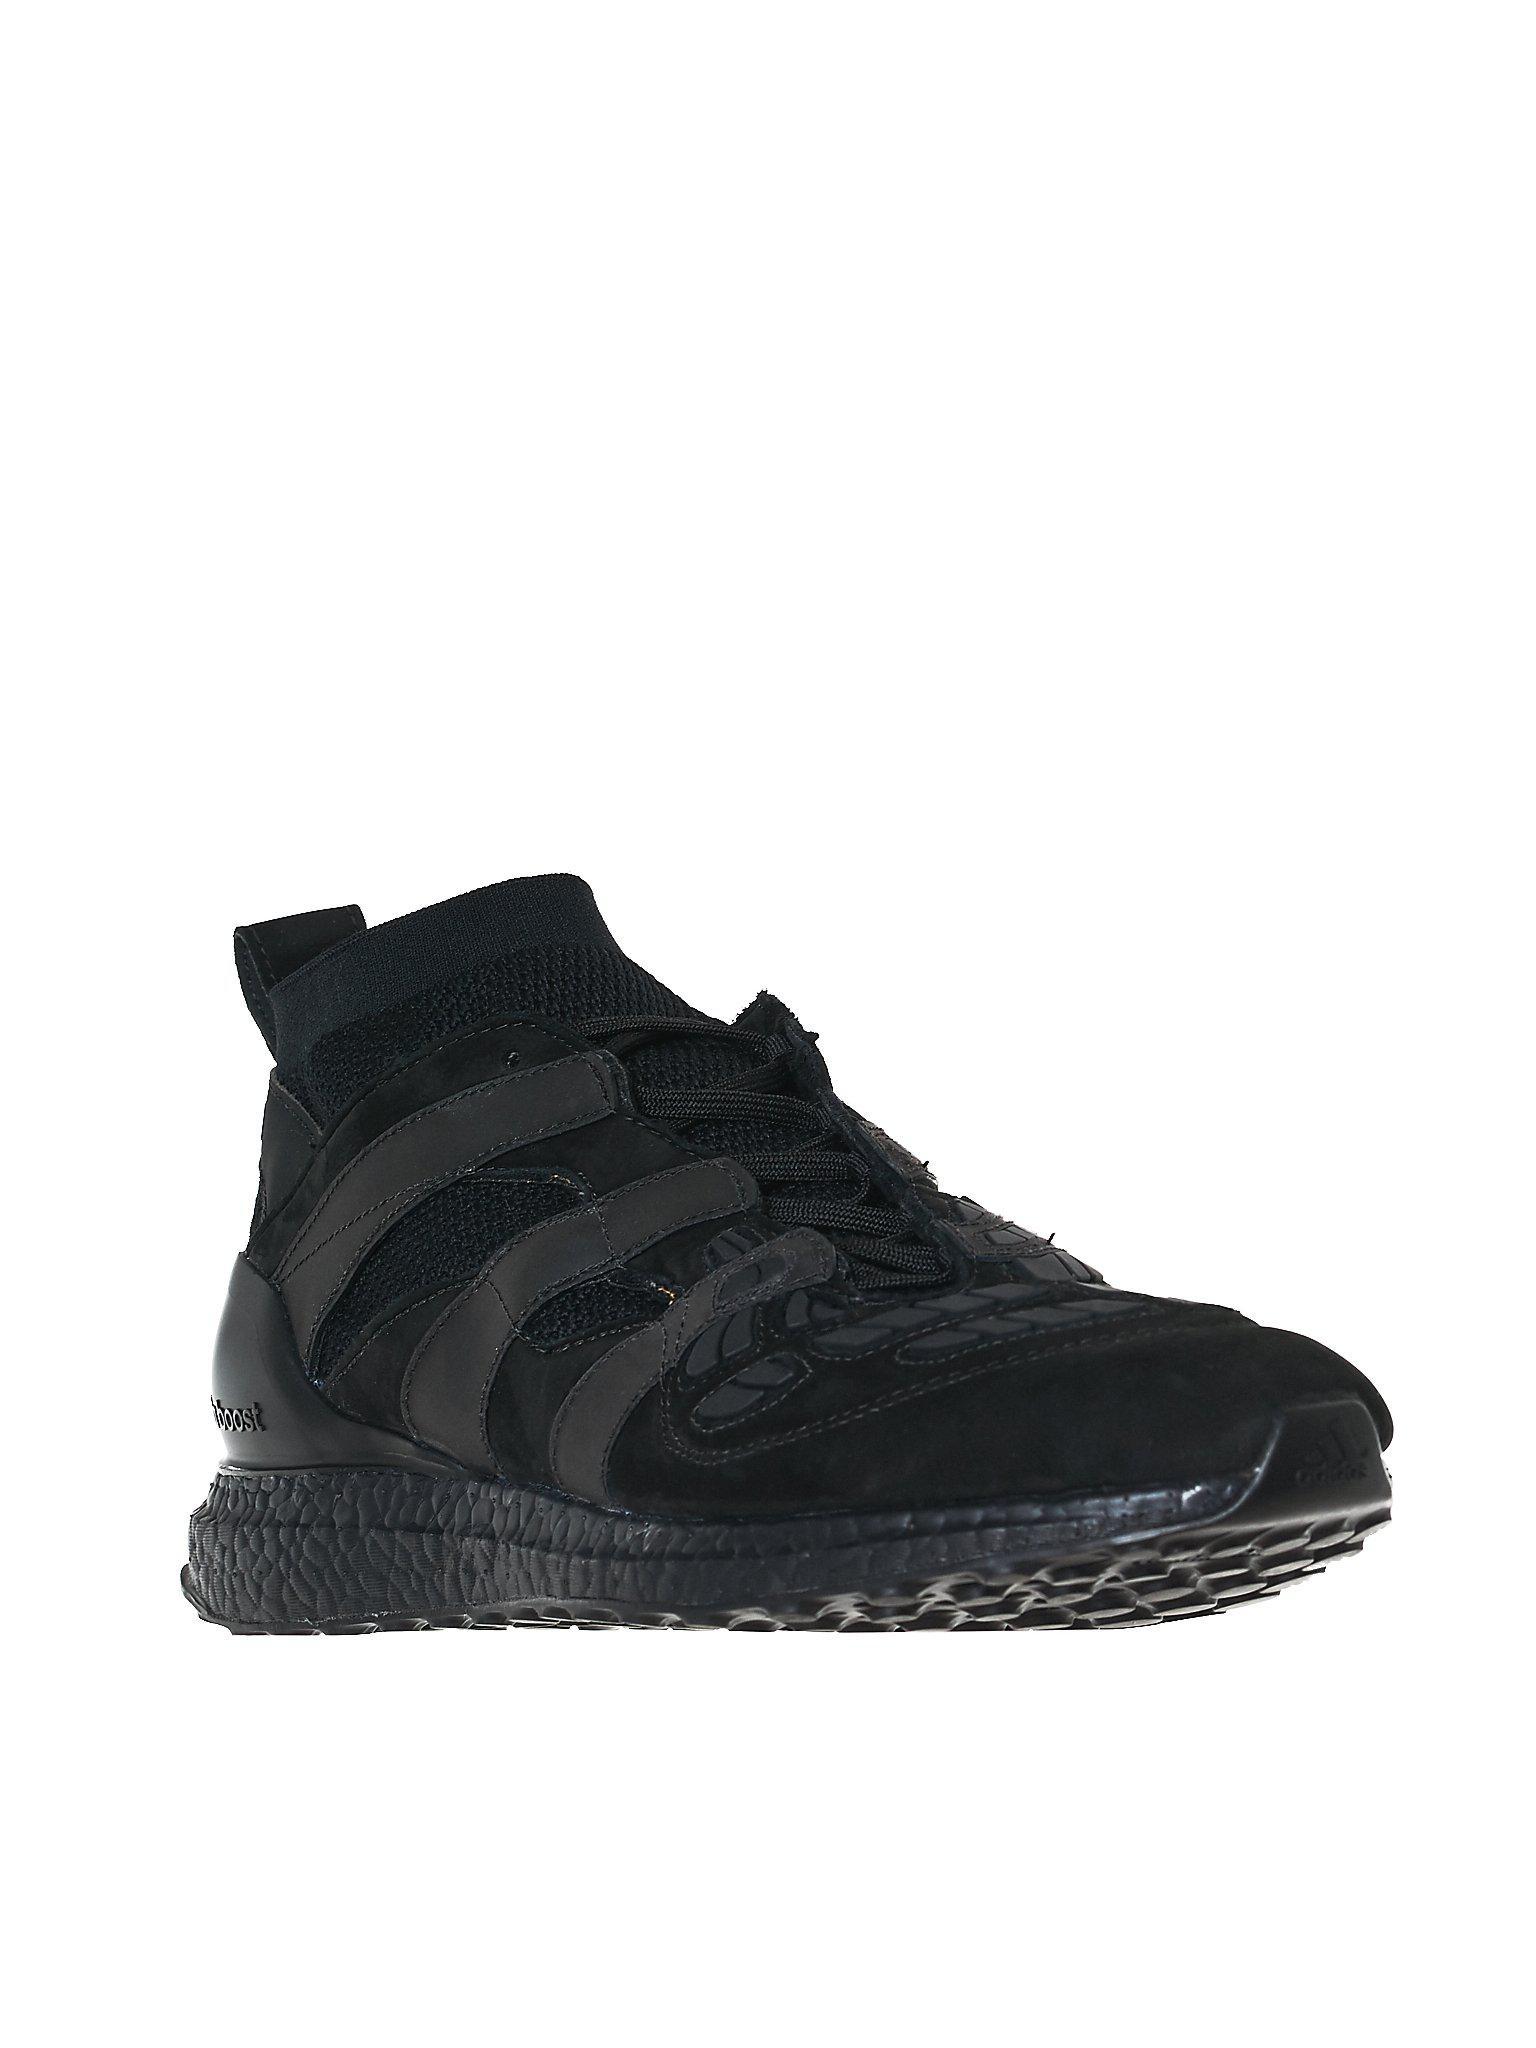 30a948824 Lyst - adidas Predator Accelerator  street  Sneakers in Black for Men